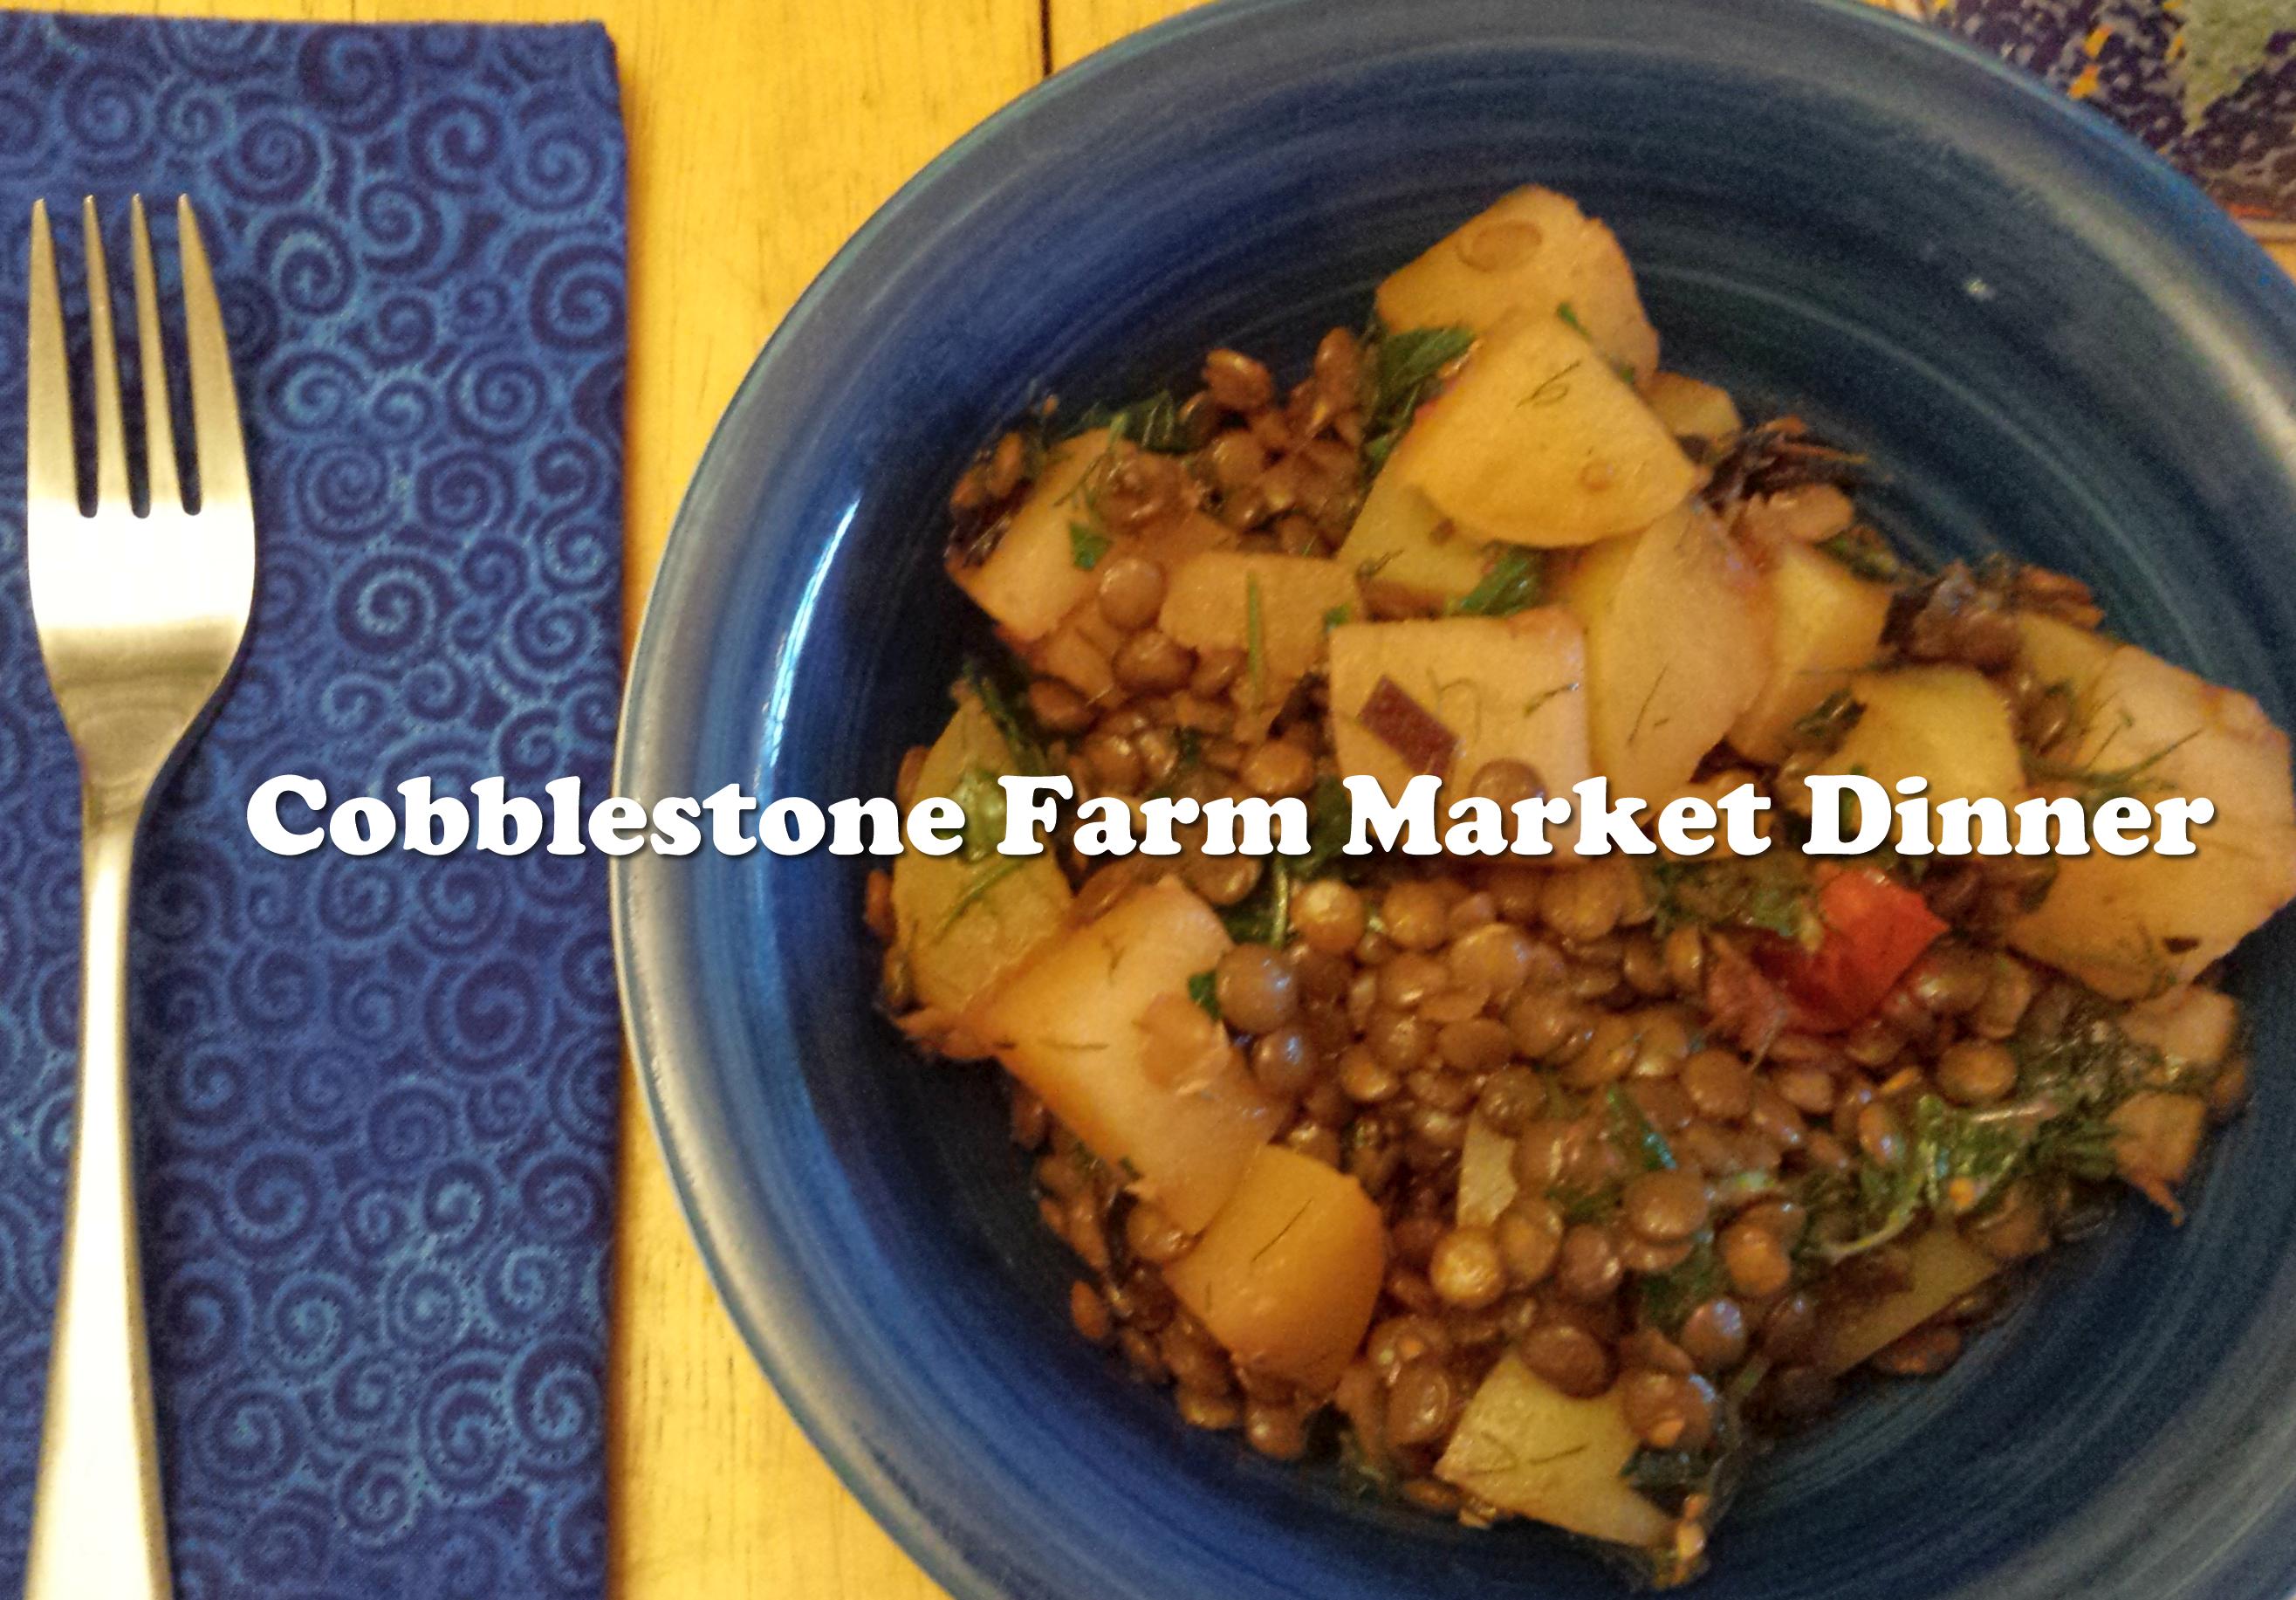 Cobblestone Farm Market Dinner